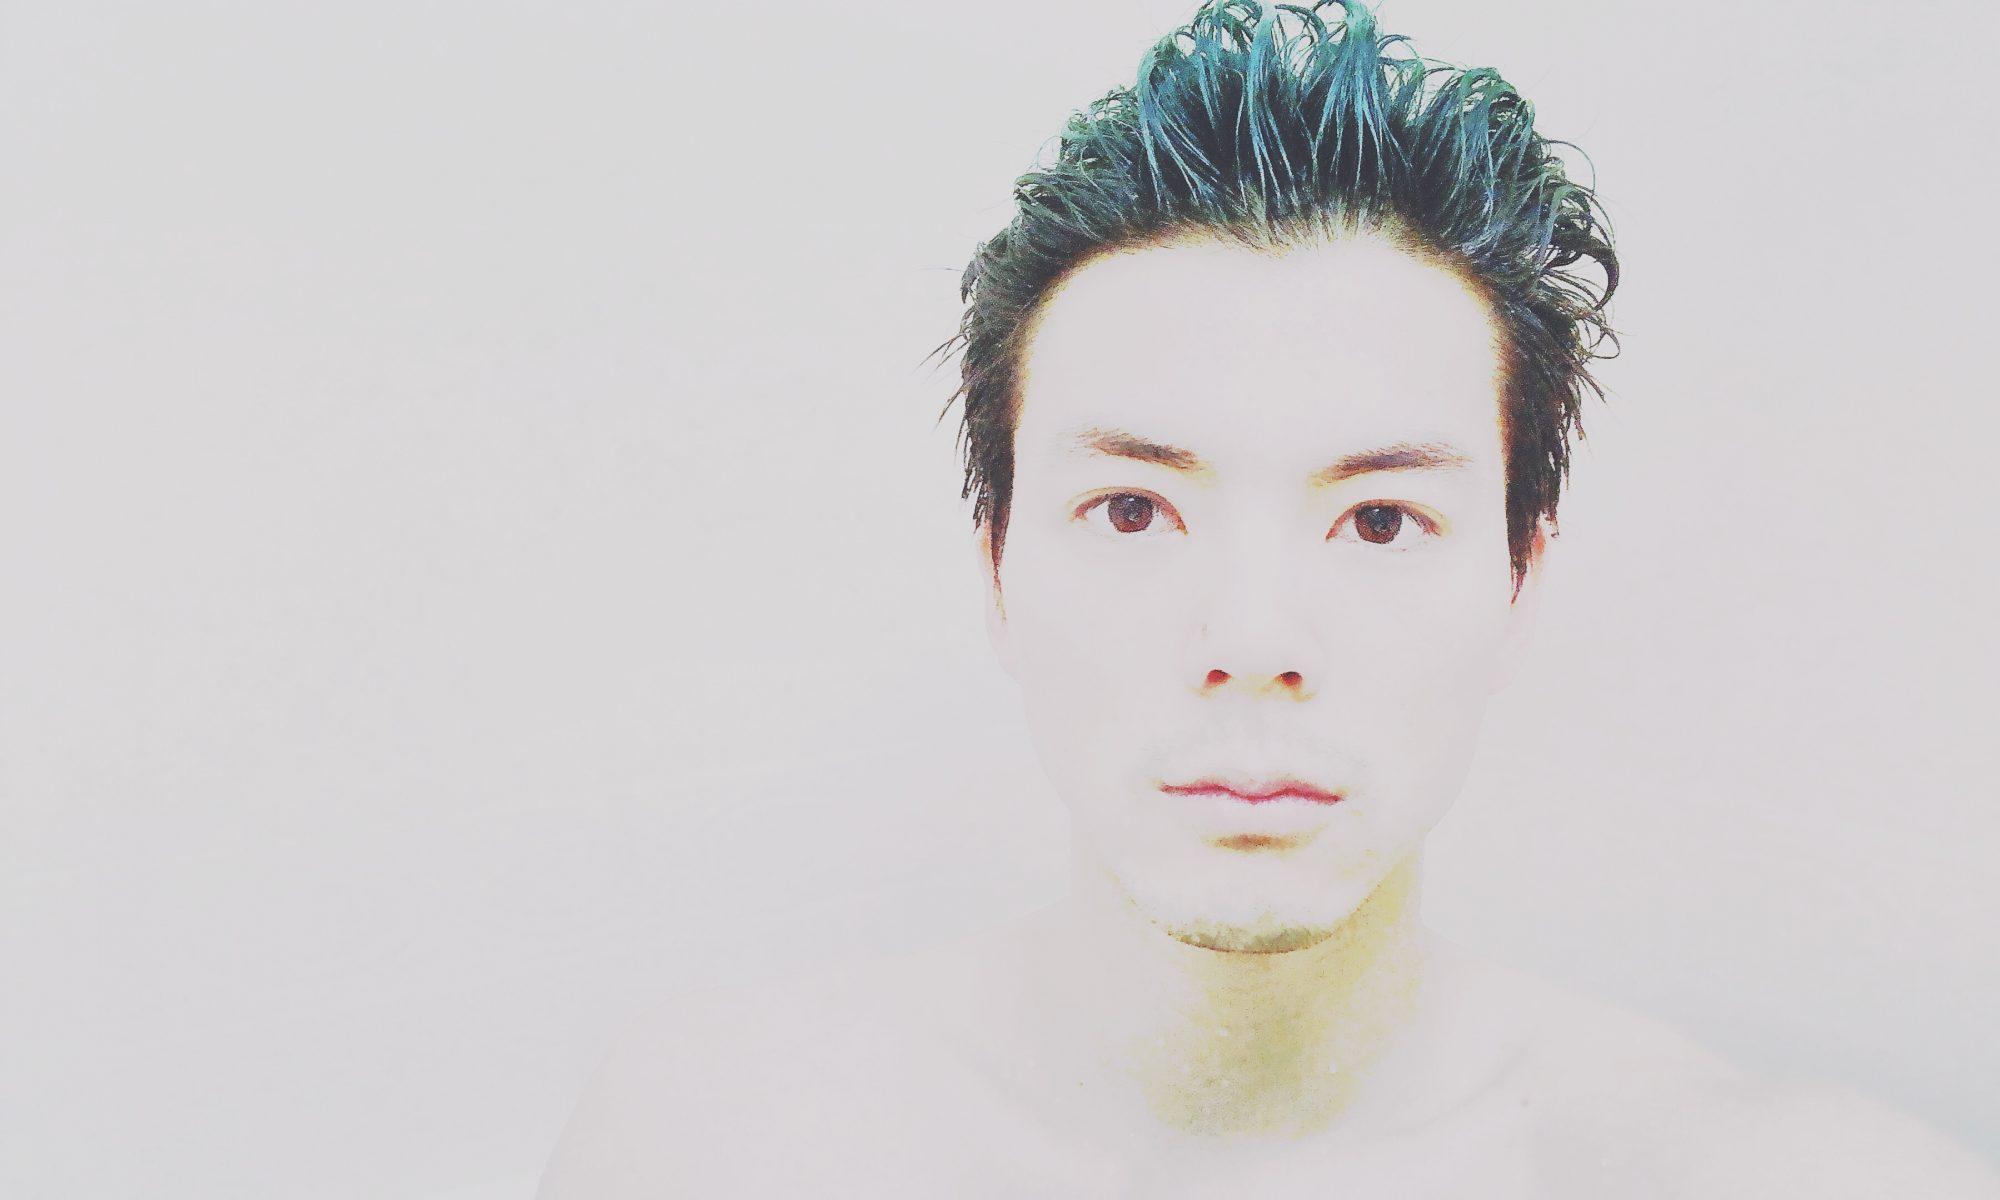 Ryuichi Okamoto